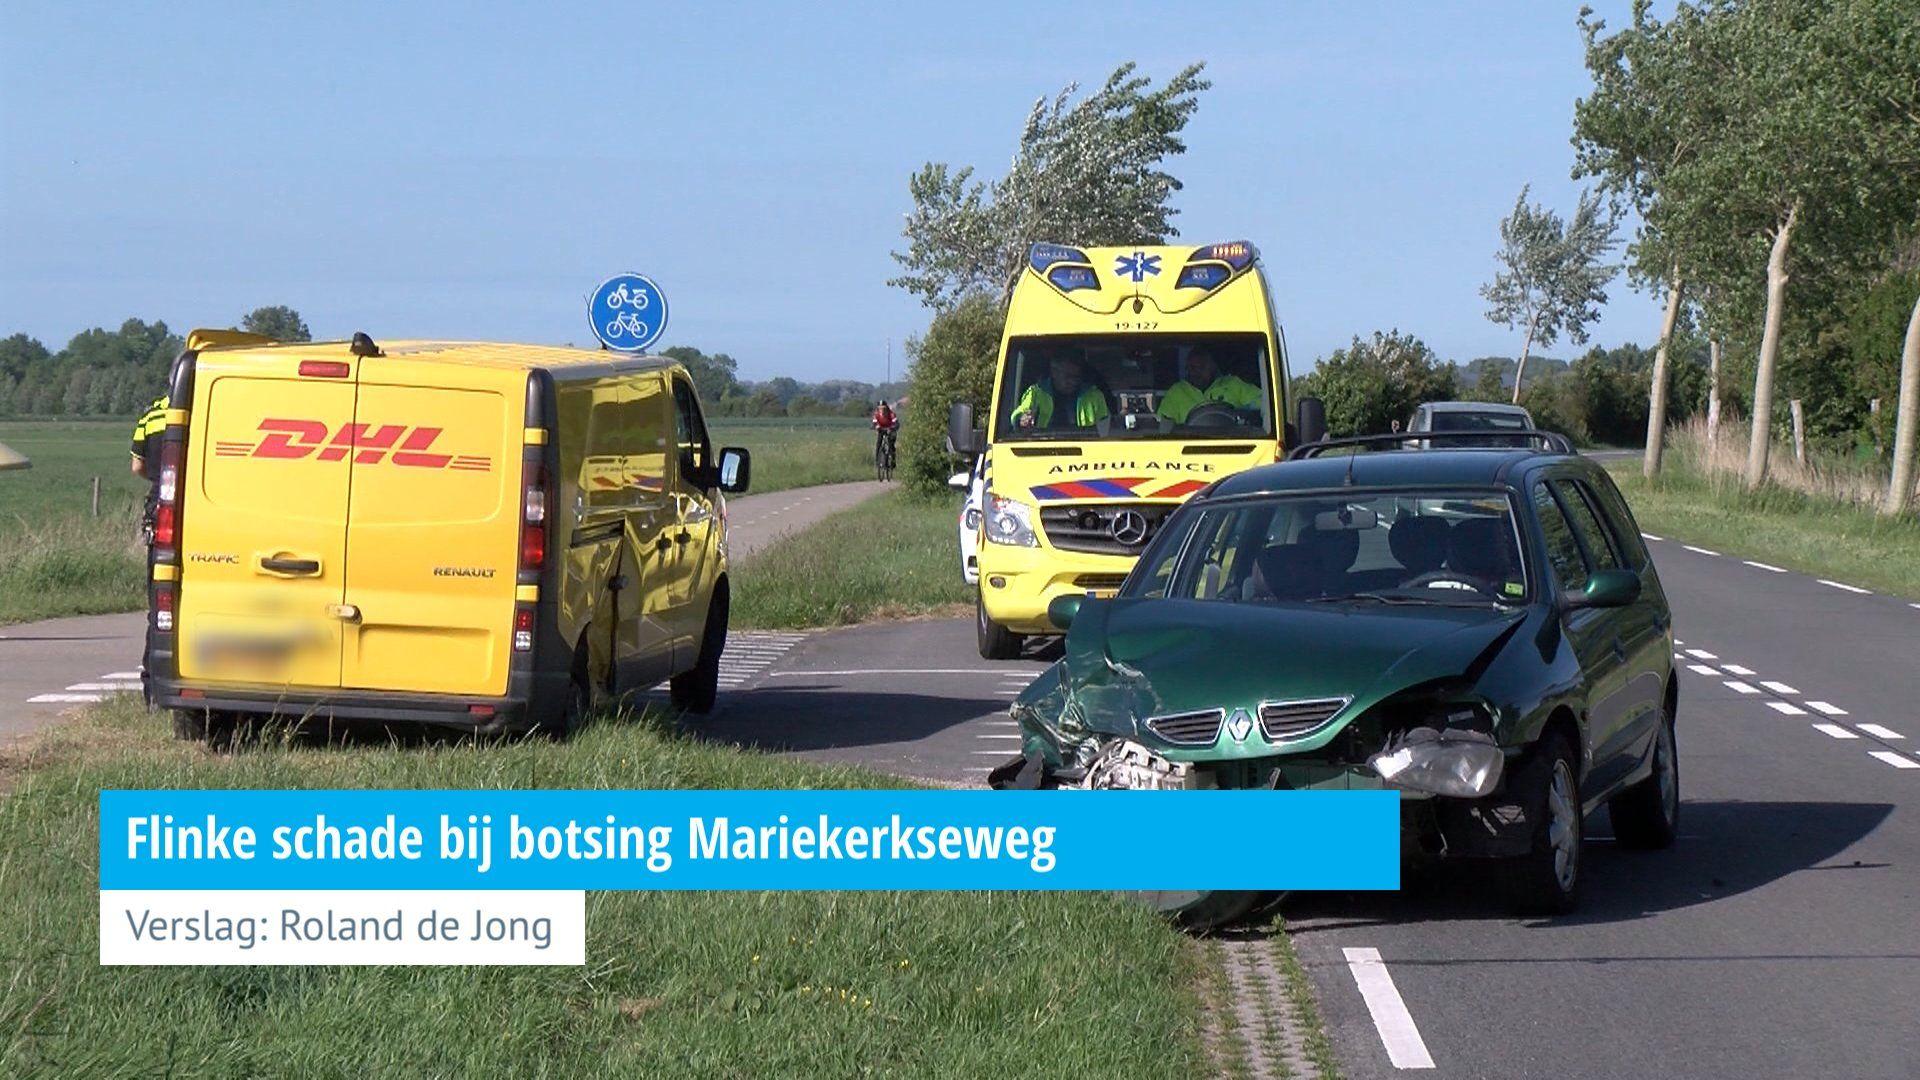 Flinke schade bij botsing Mariekerkseweg - HVZeeland